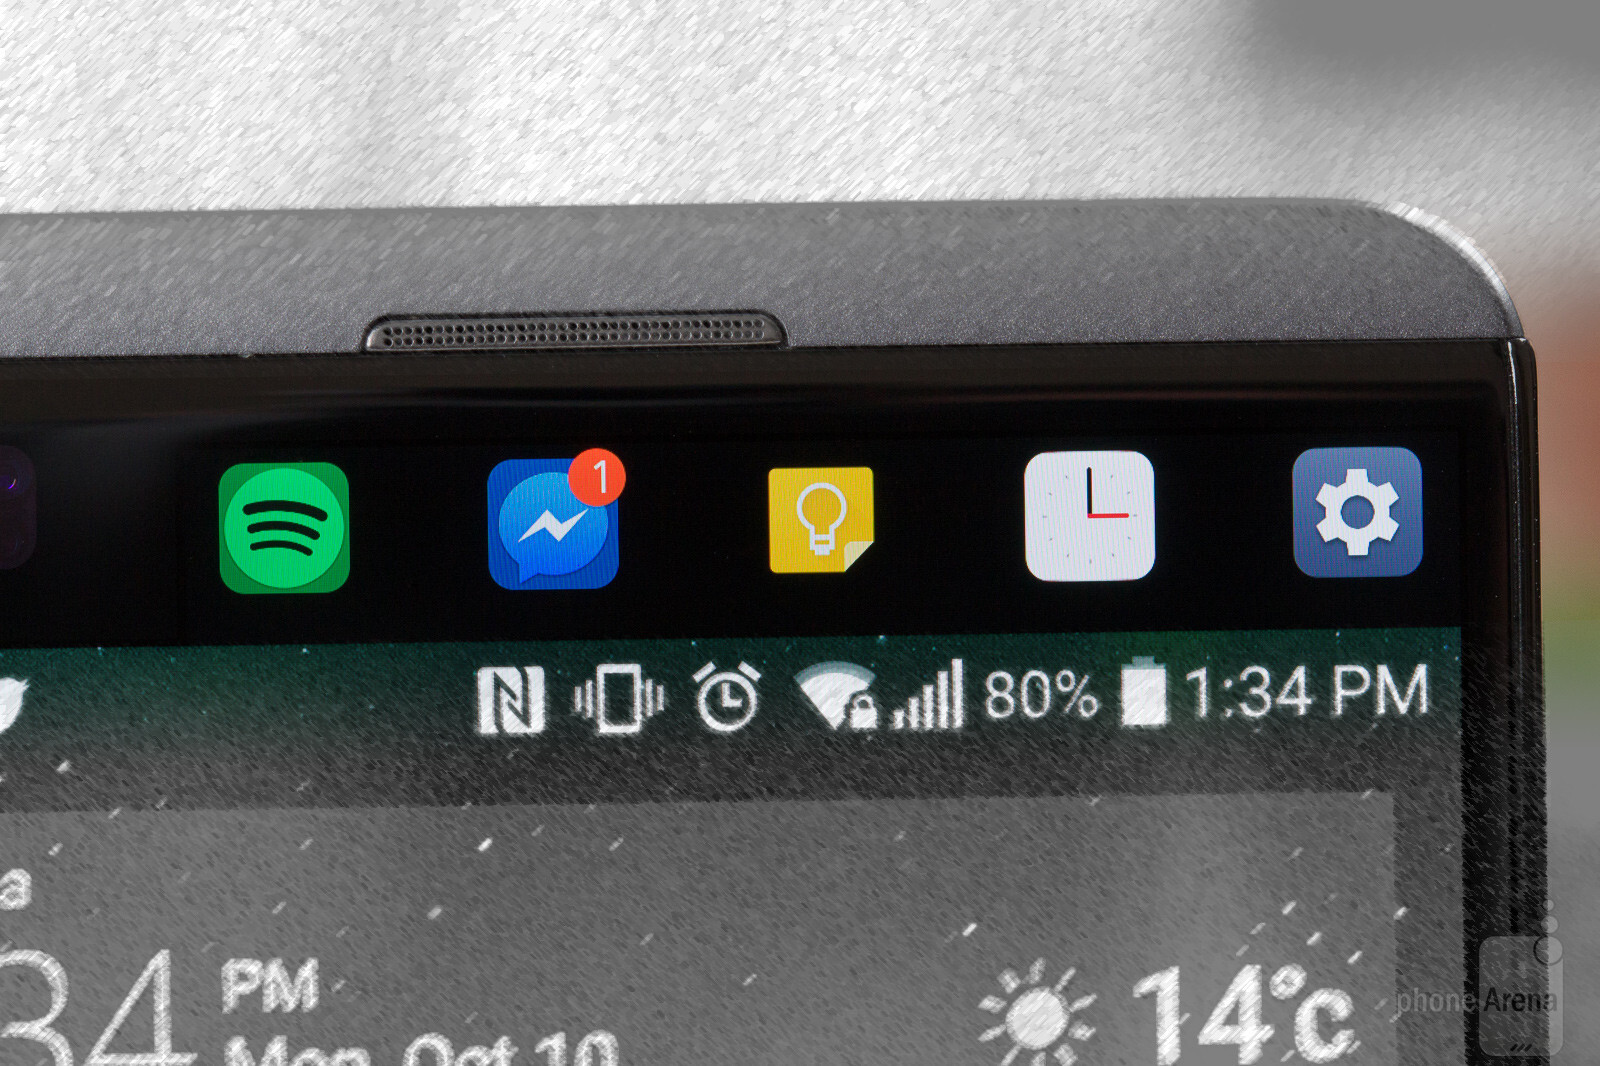 LG V20 Review - PhoneArena